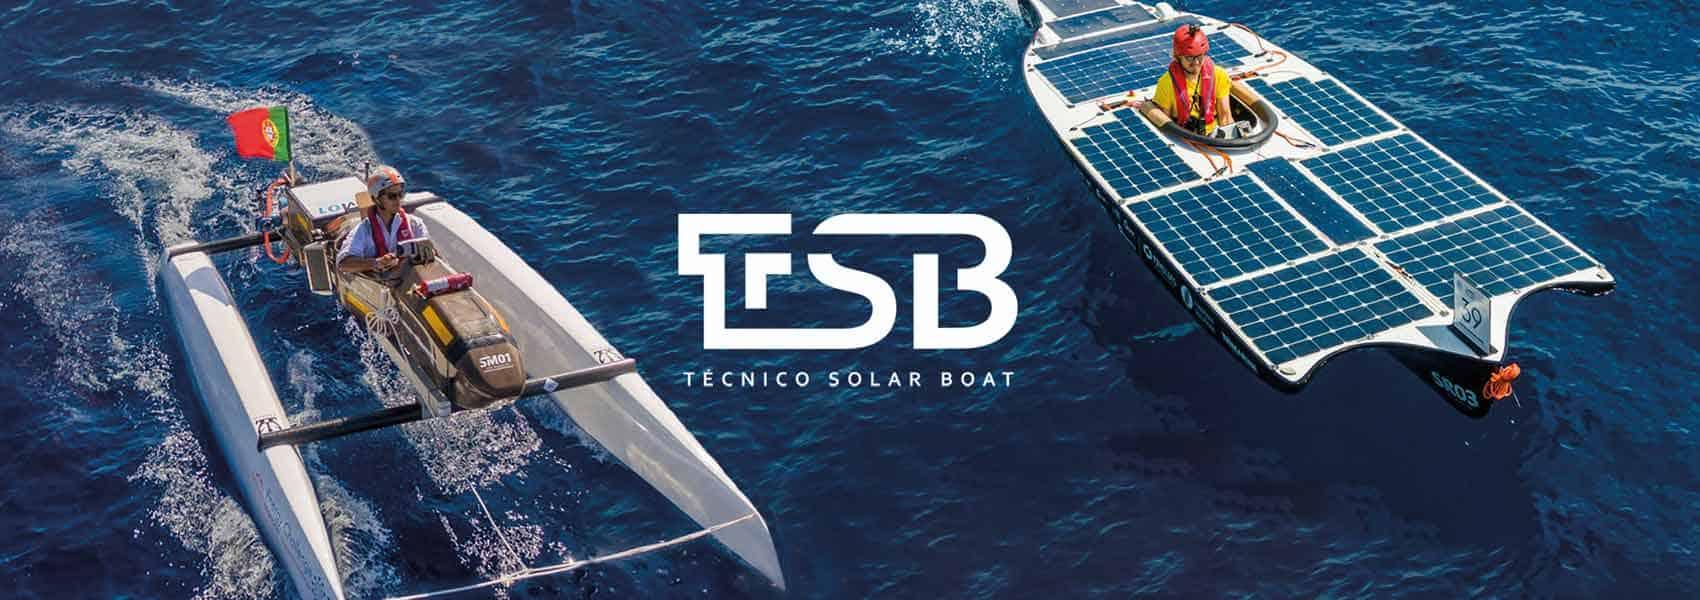 Técnico-Solar-Boat-Blog-Banner